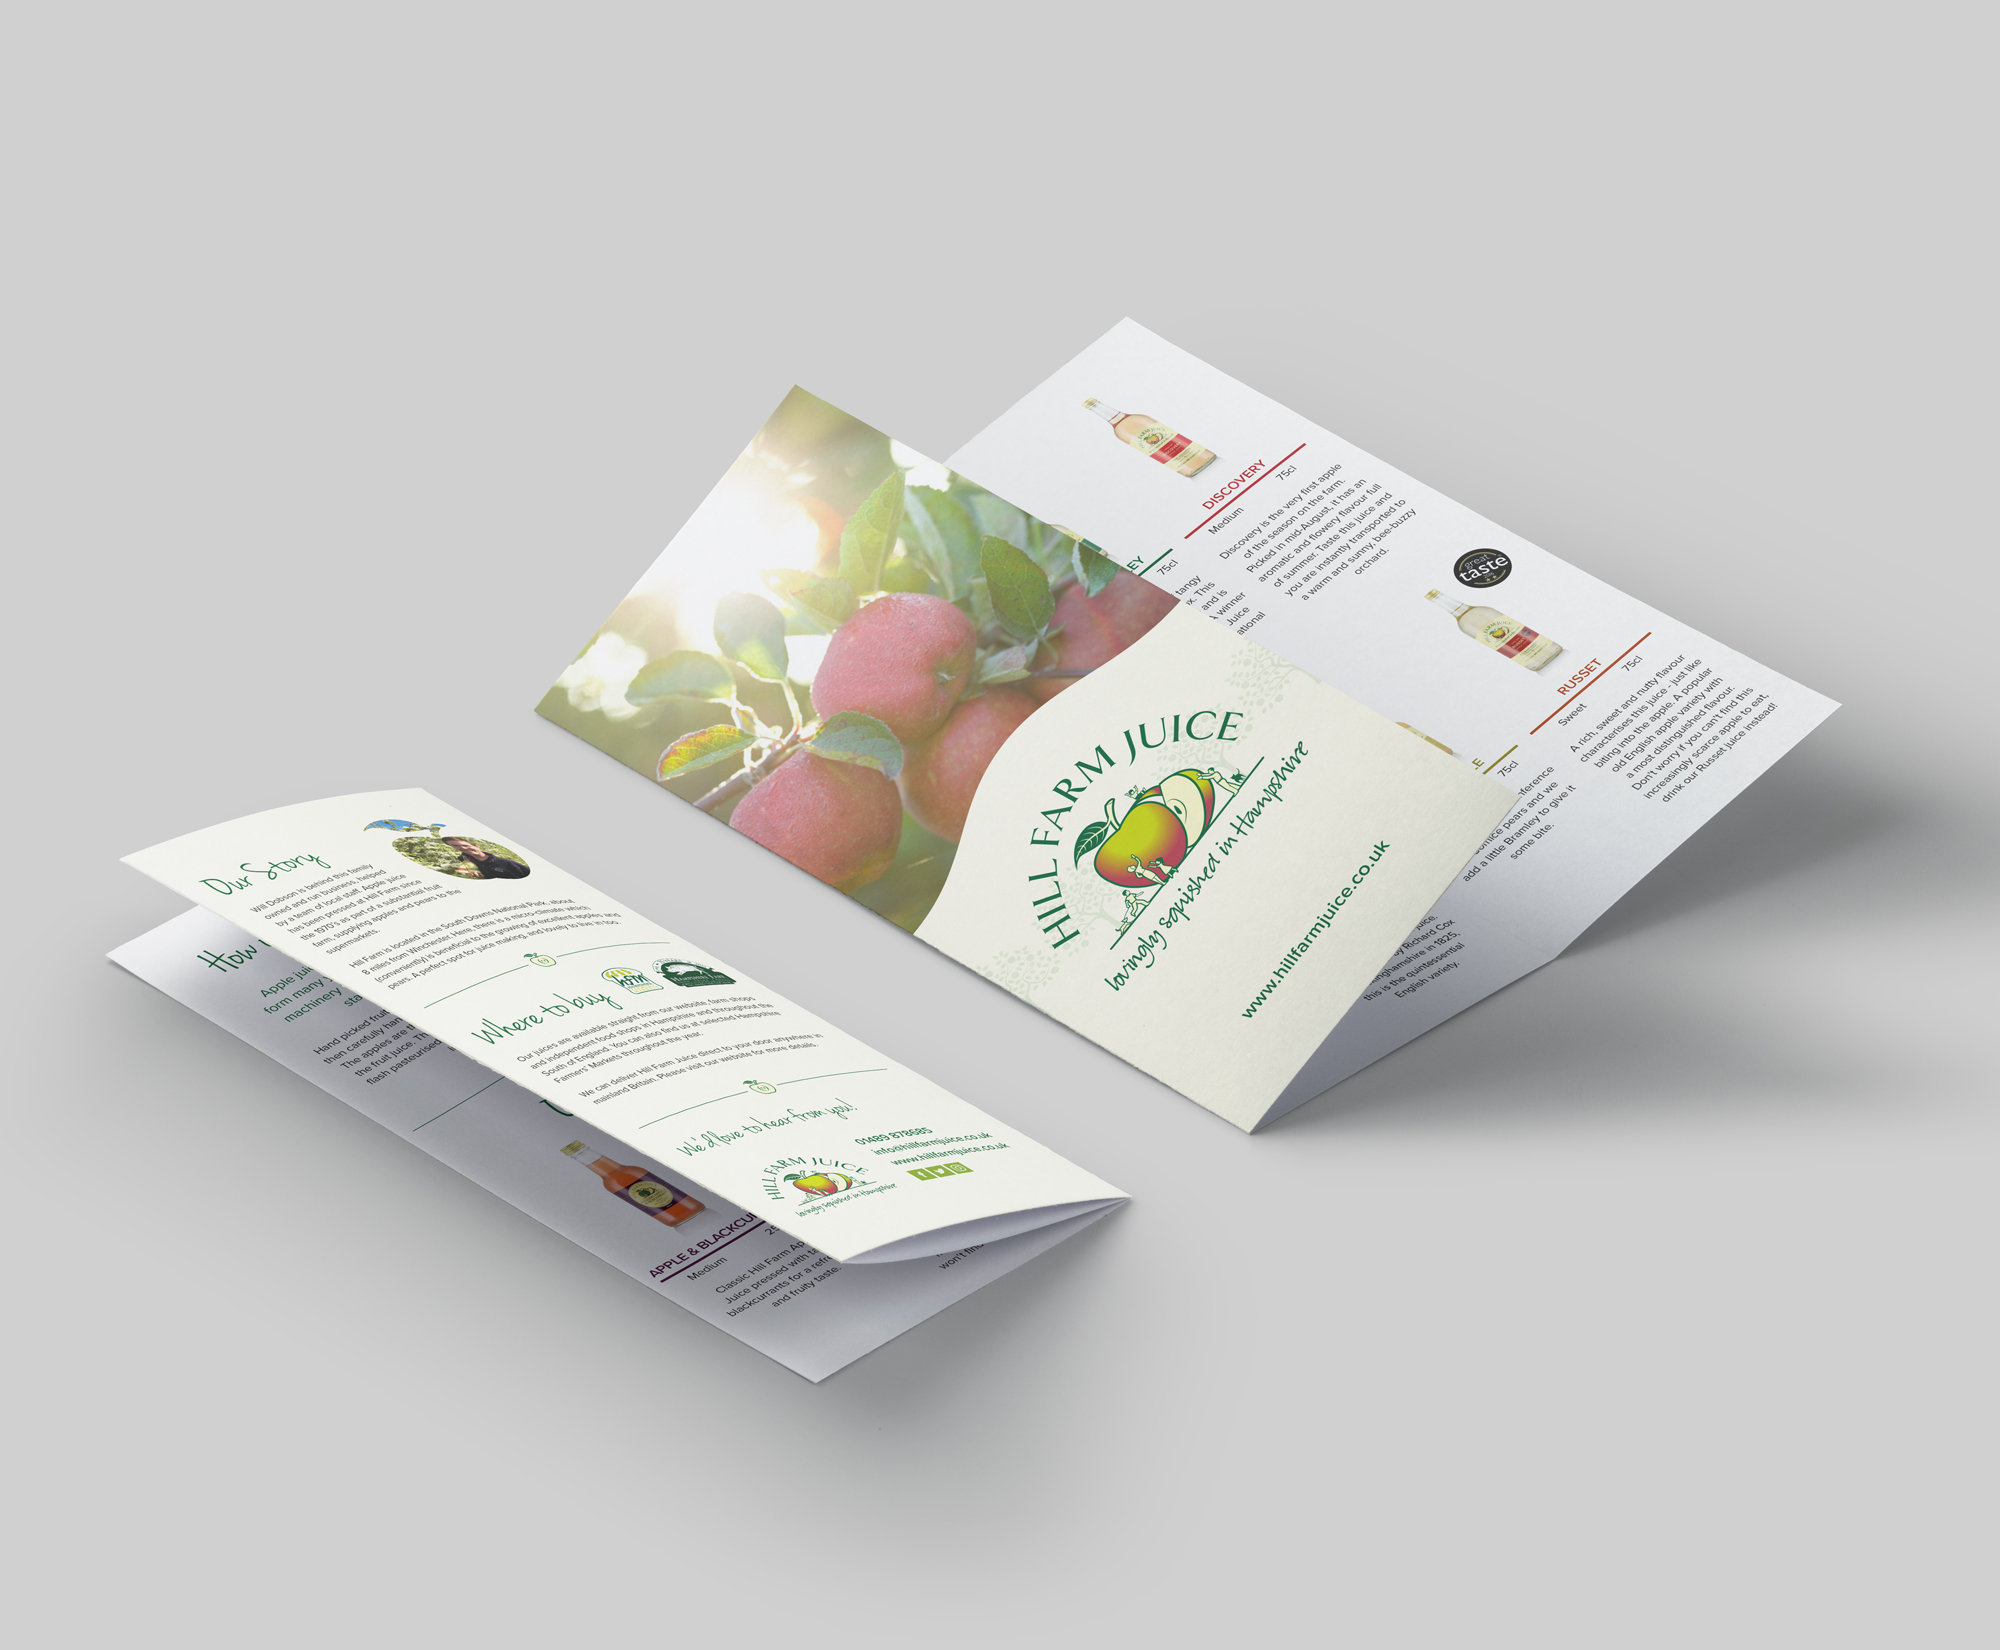 Hill Farm Juice Leaflet Design